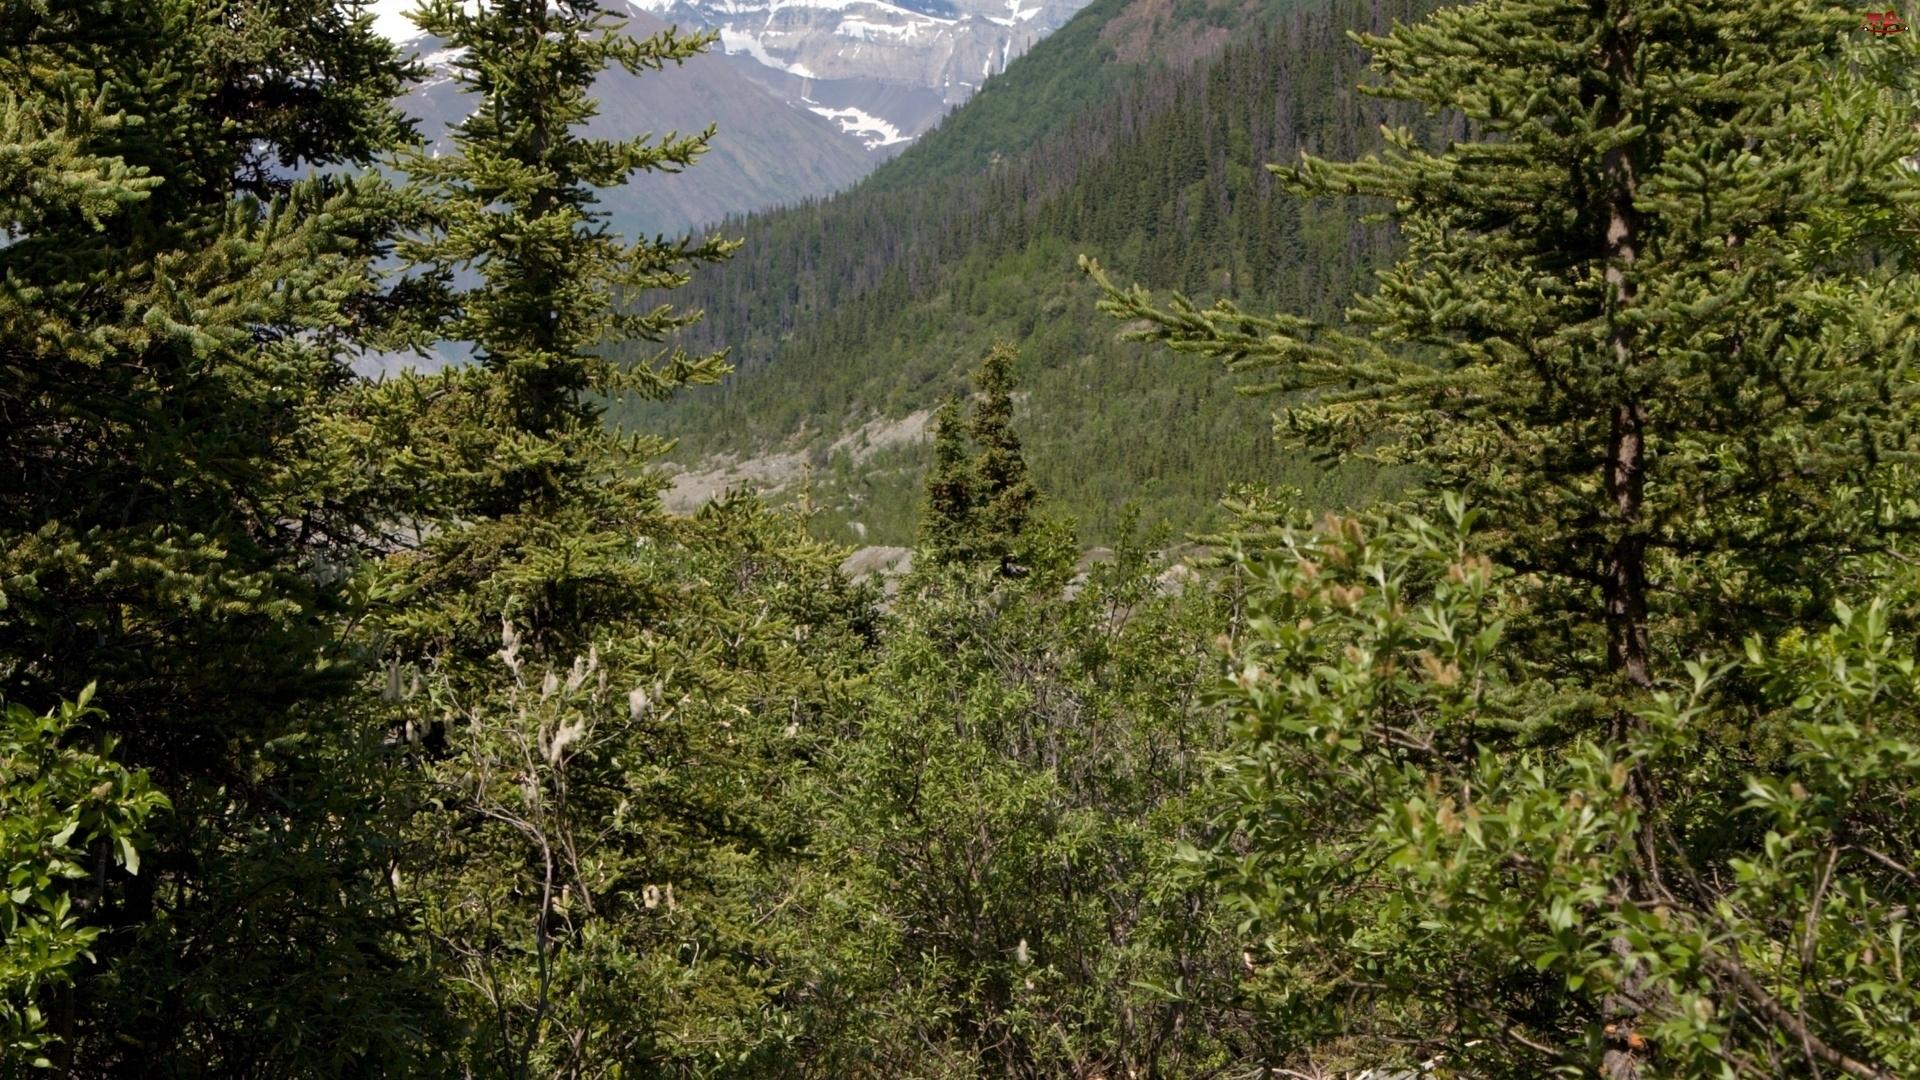 Drzewa, Góry, Las